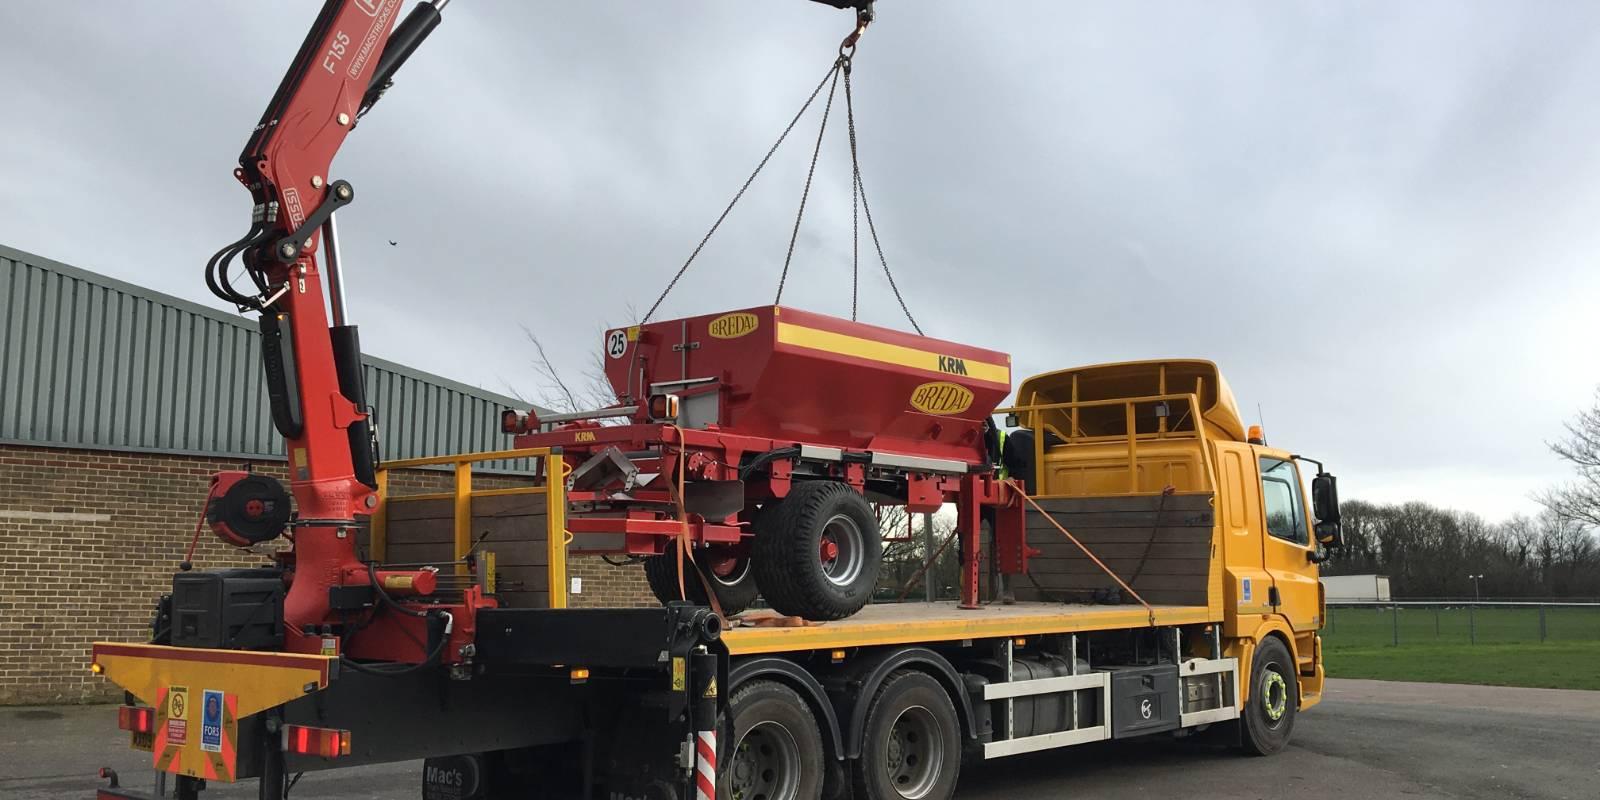 agri-expo-2017-lorry-arriving.jpg